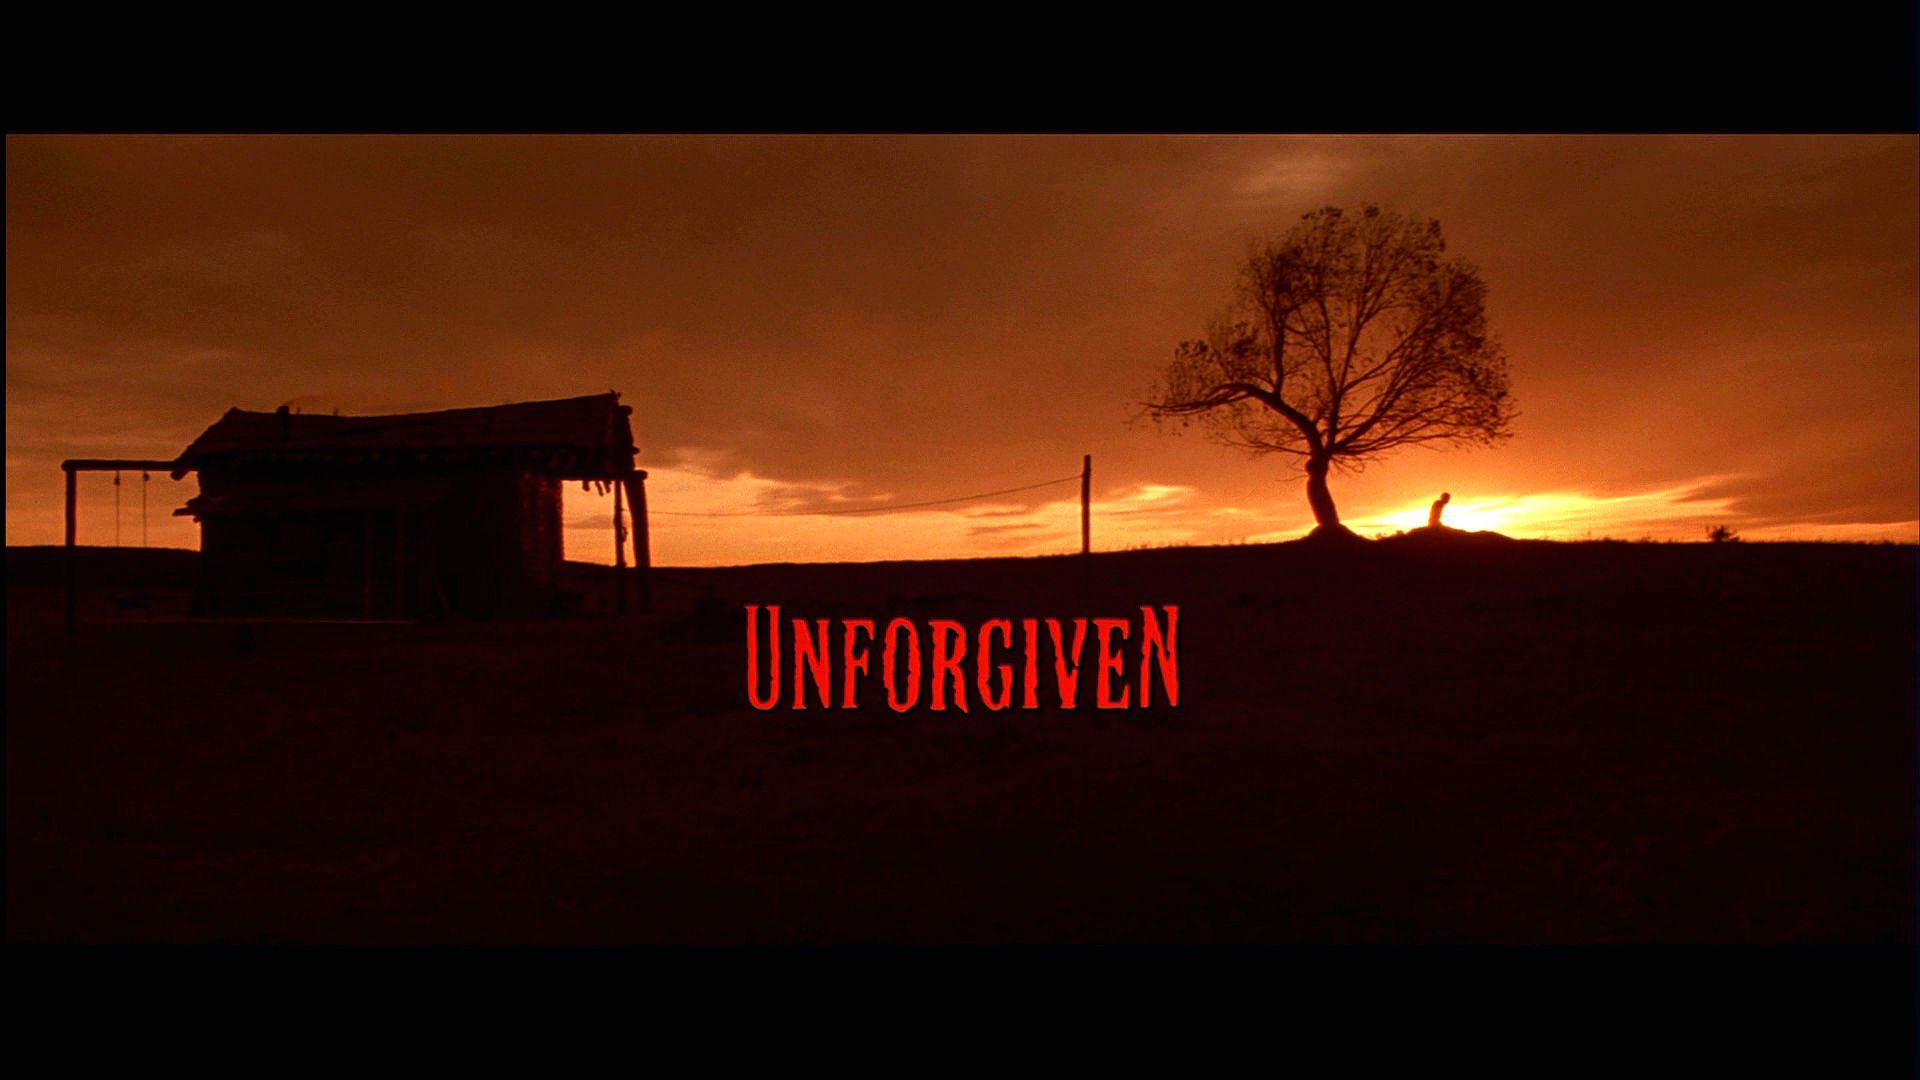 Unforgiven Poster UNFORGIVEN western clint